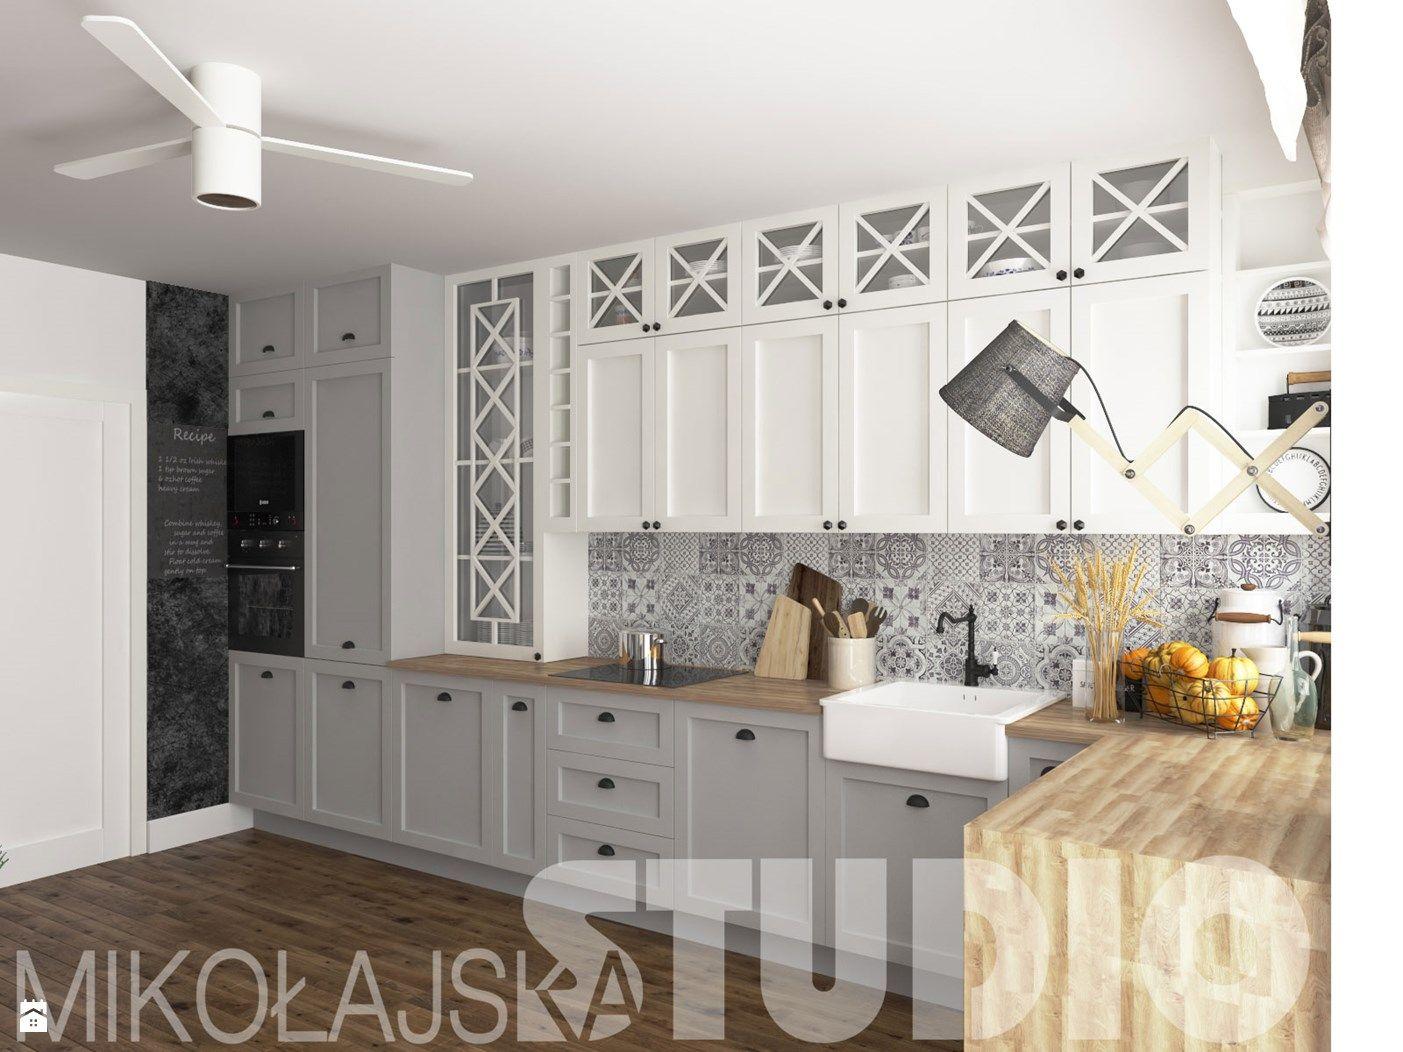 58 best kuchnia images on pinterest modern kitchens kitchen rural kitchen design zdj cie od miko ajskastudio kuchnia styl rustykalny miko ajskastudio